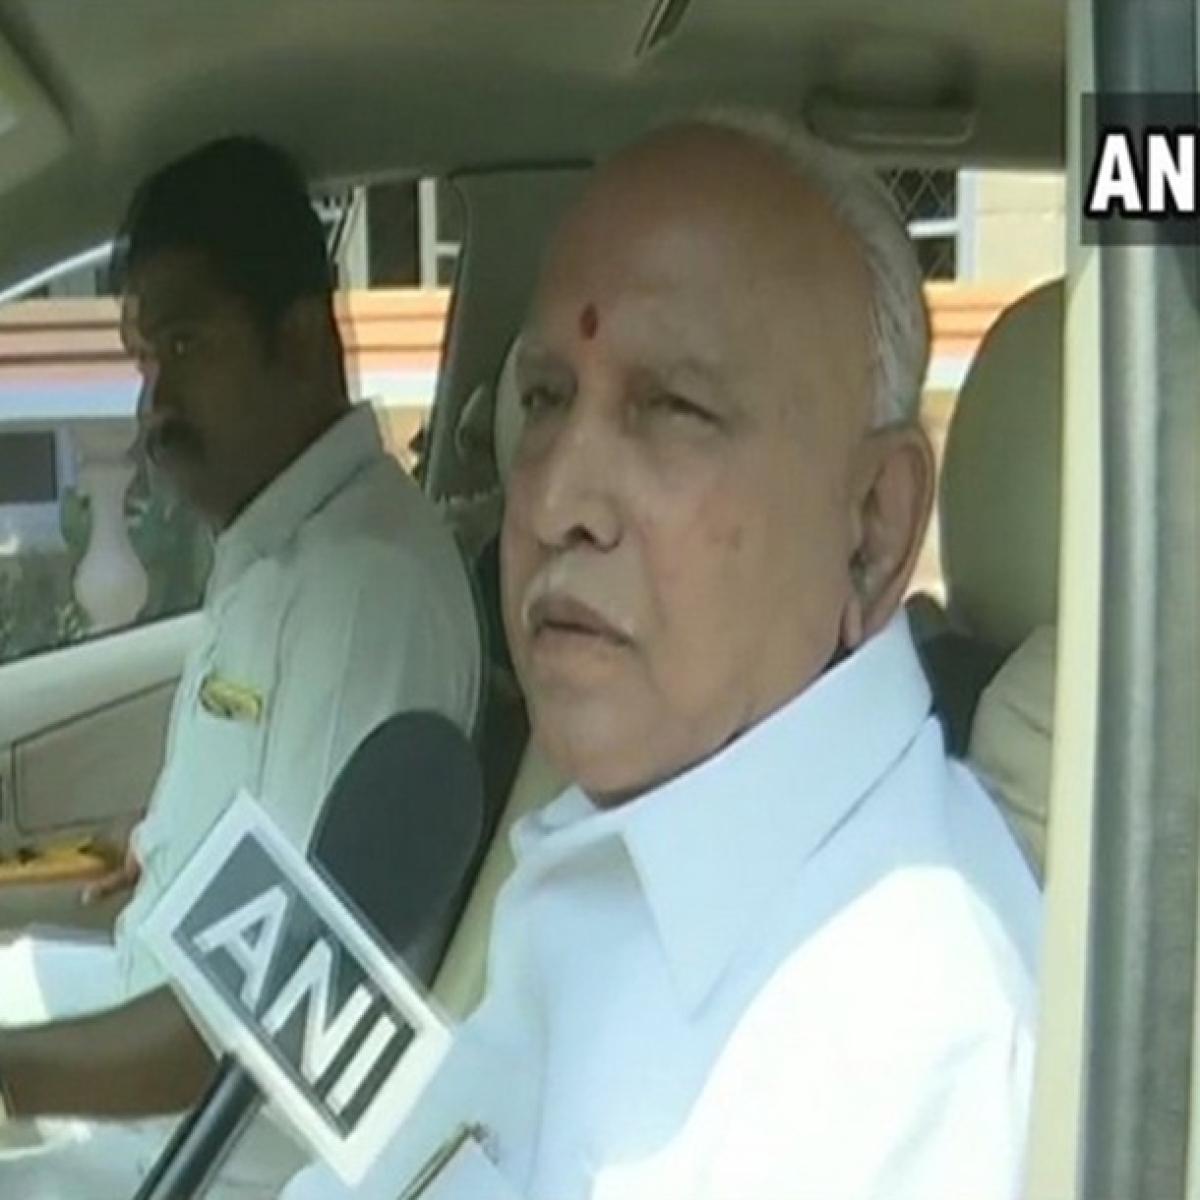 Karnataka political crisis: BJP books 30 rooms for its MLAs in Bengaluru hotel